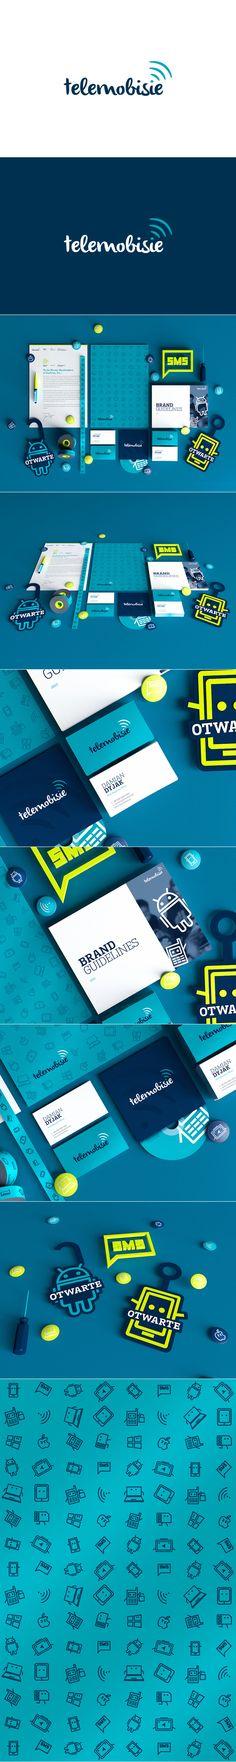 Cool Brand Identity Design. Telemobisie. #branding #brandidentity [http://www.pinterest.com/alfredchong/]